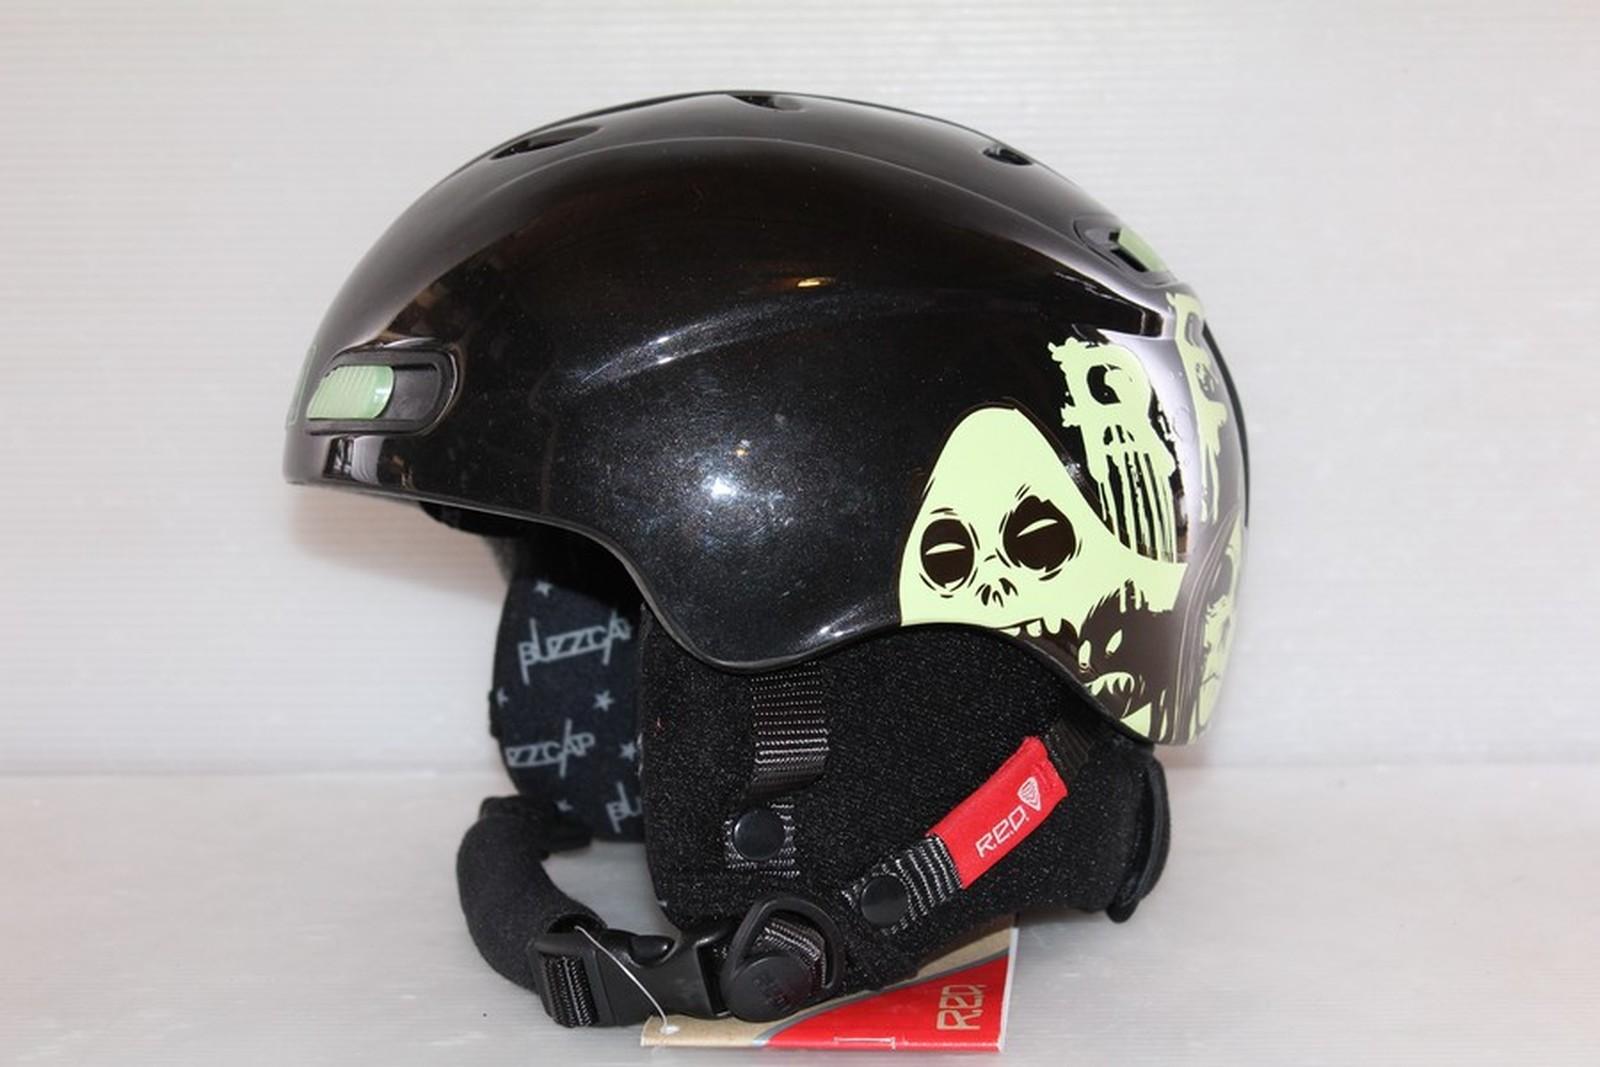 Dámská lyžařská helma RED Buzz-cap II posuvná - posuvná vel. 51 - 53